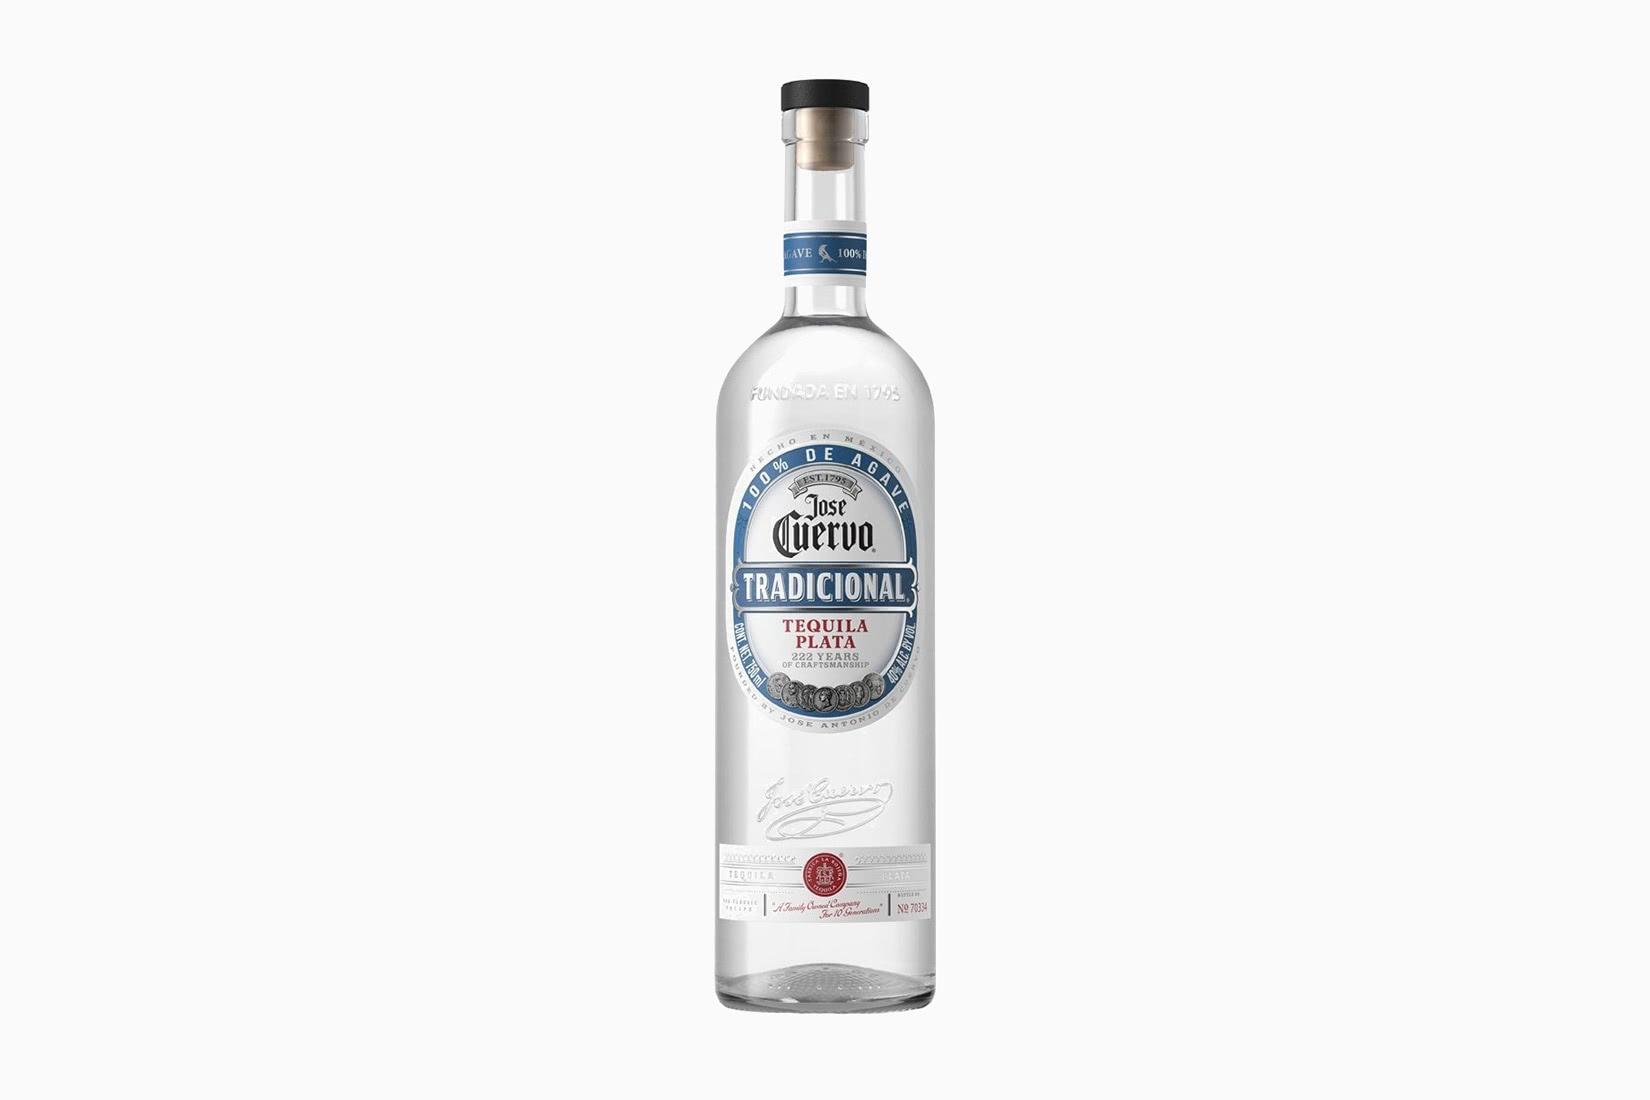 jose cuervo tequila plata bottle price size - Luxe Digital